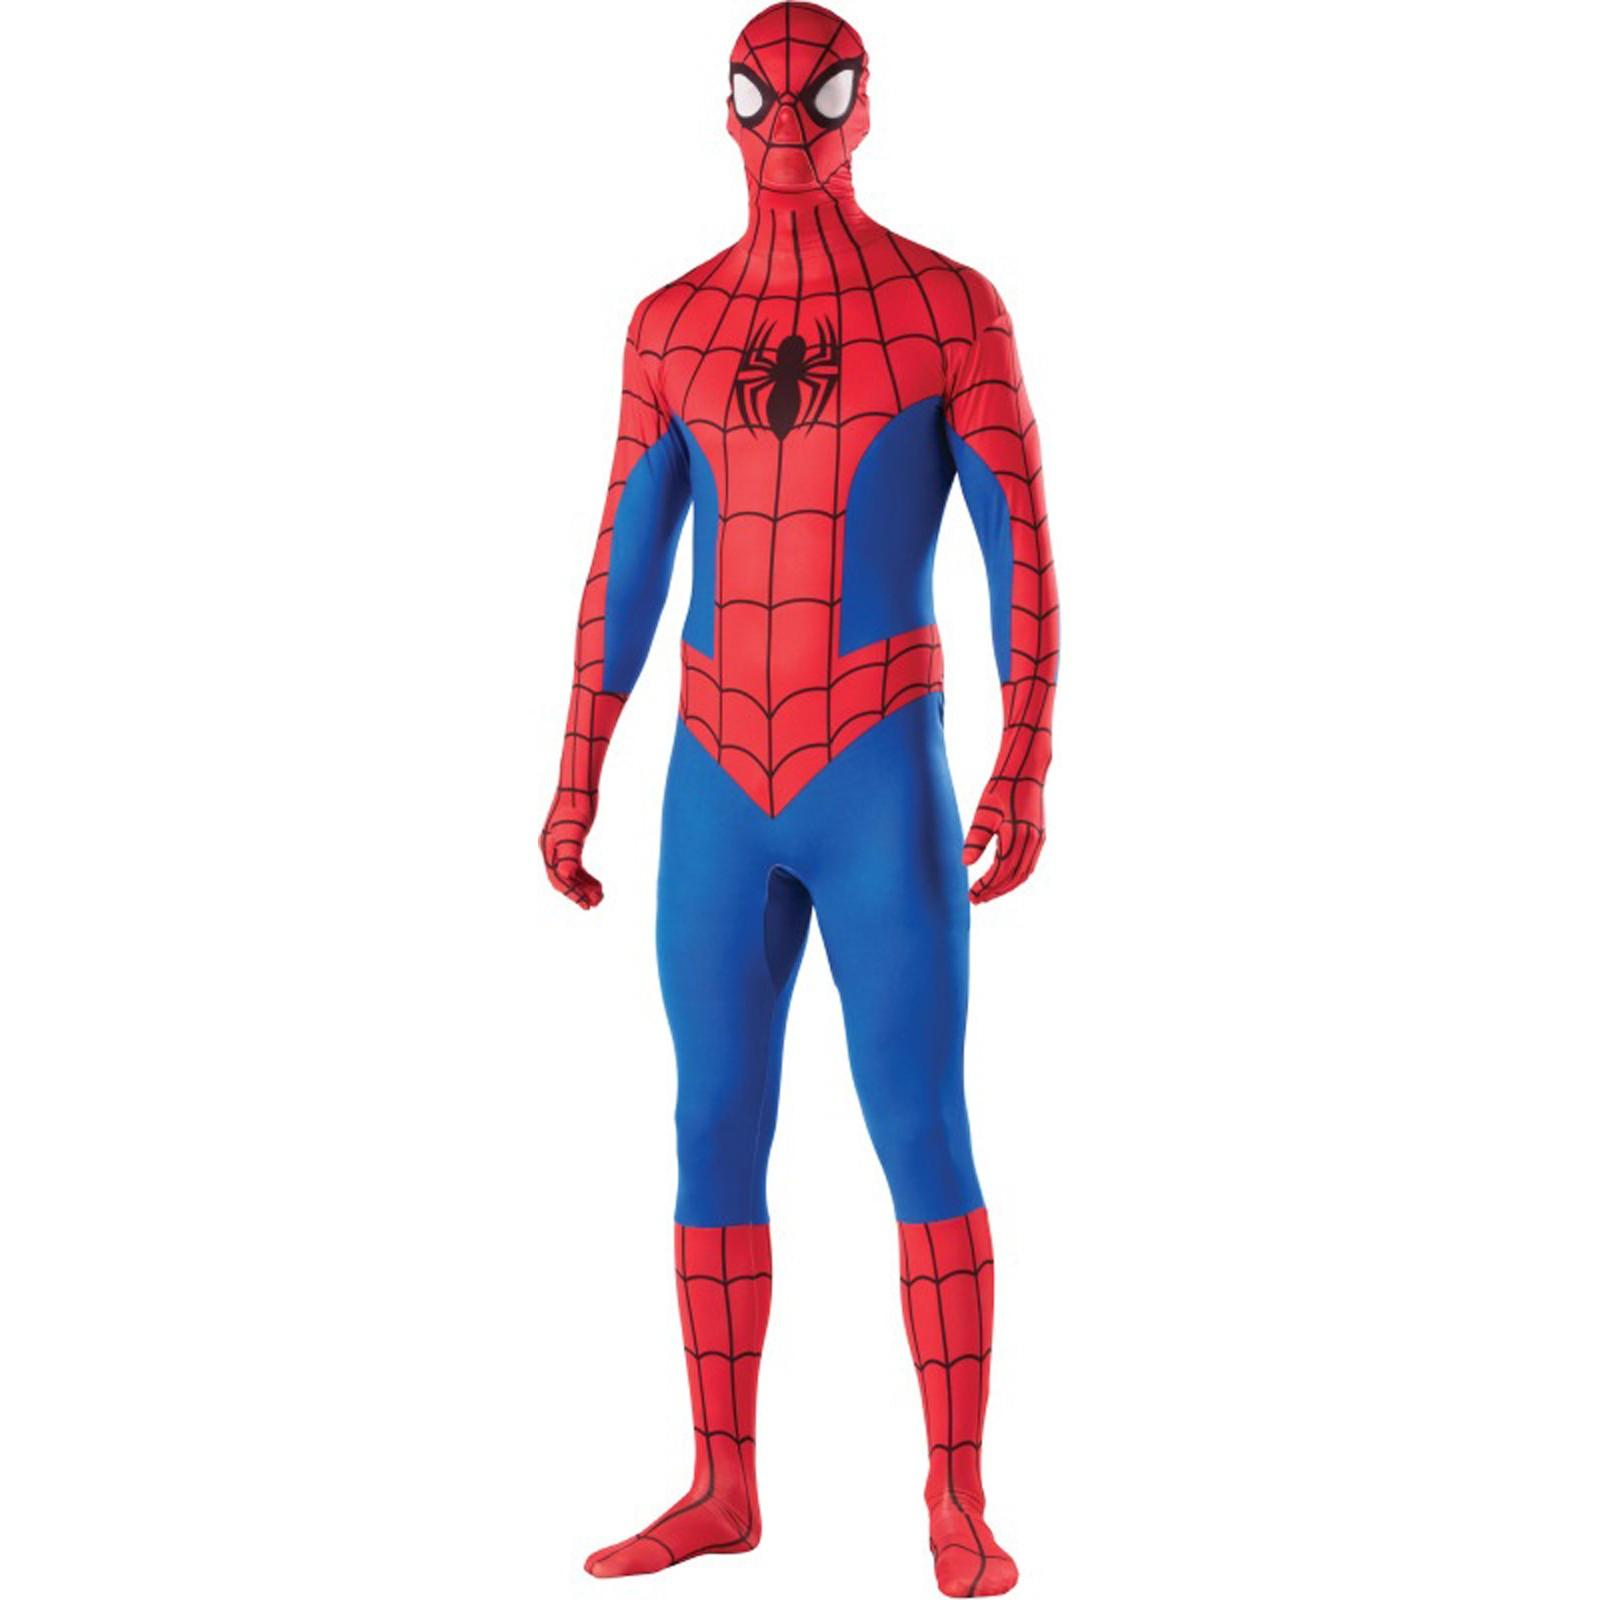 Mens Spiderman Second Skin Halloween Costume by Marvel